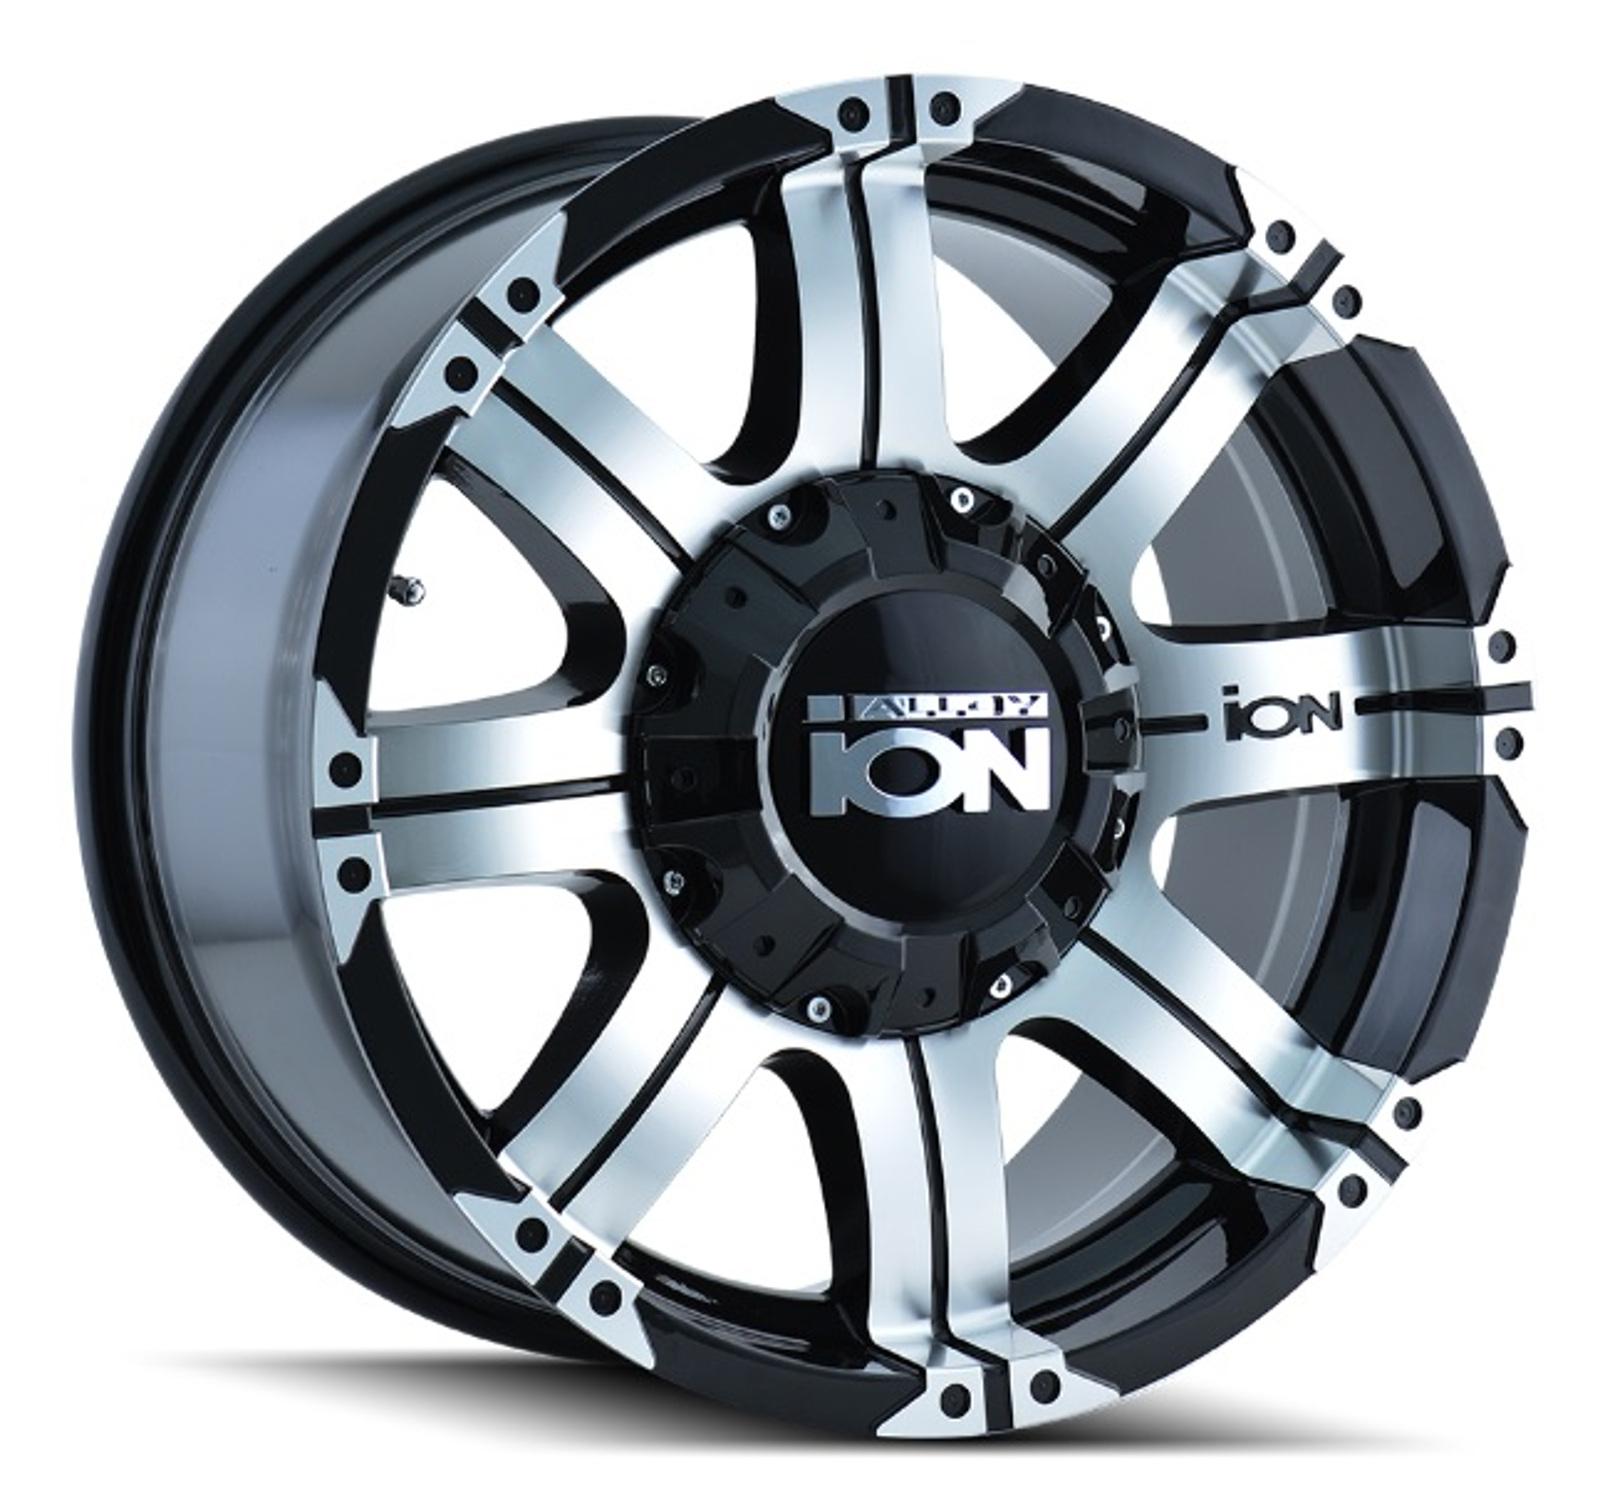 Ion Wheels 187-7937B18 Single 187 Black/Machined Face/Machined Lip 17x9 Wheel